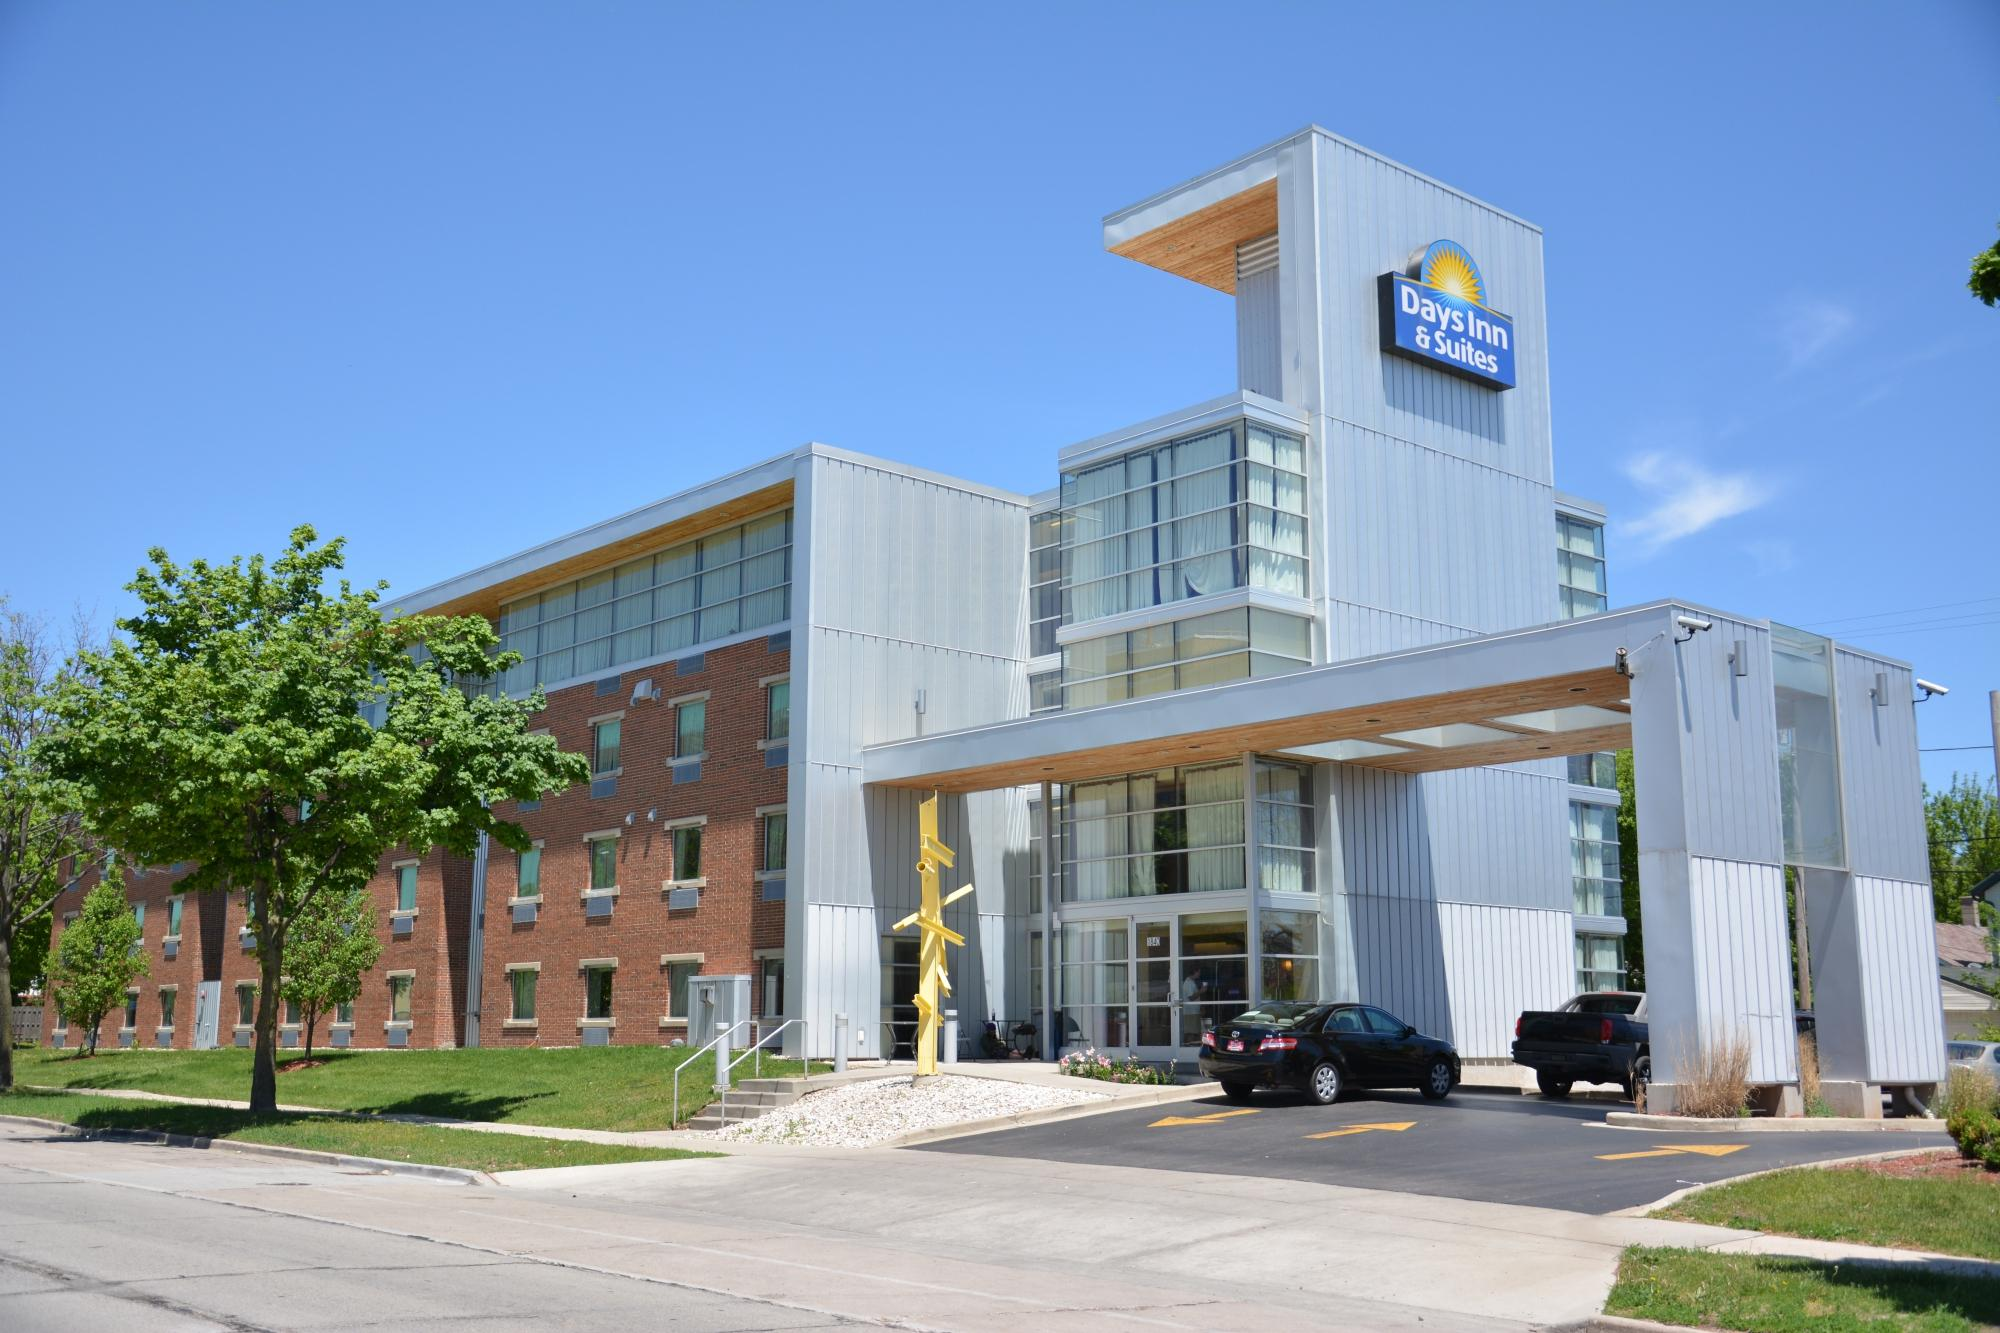 Days Inn & Suites Milwaukee